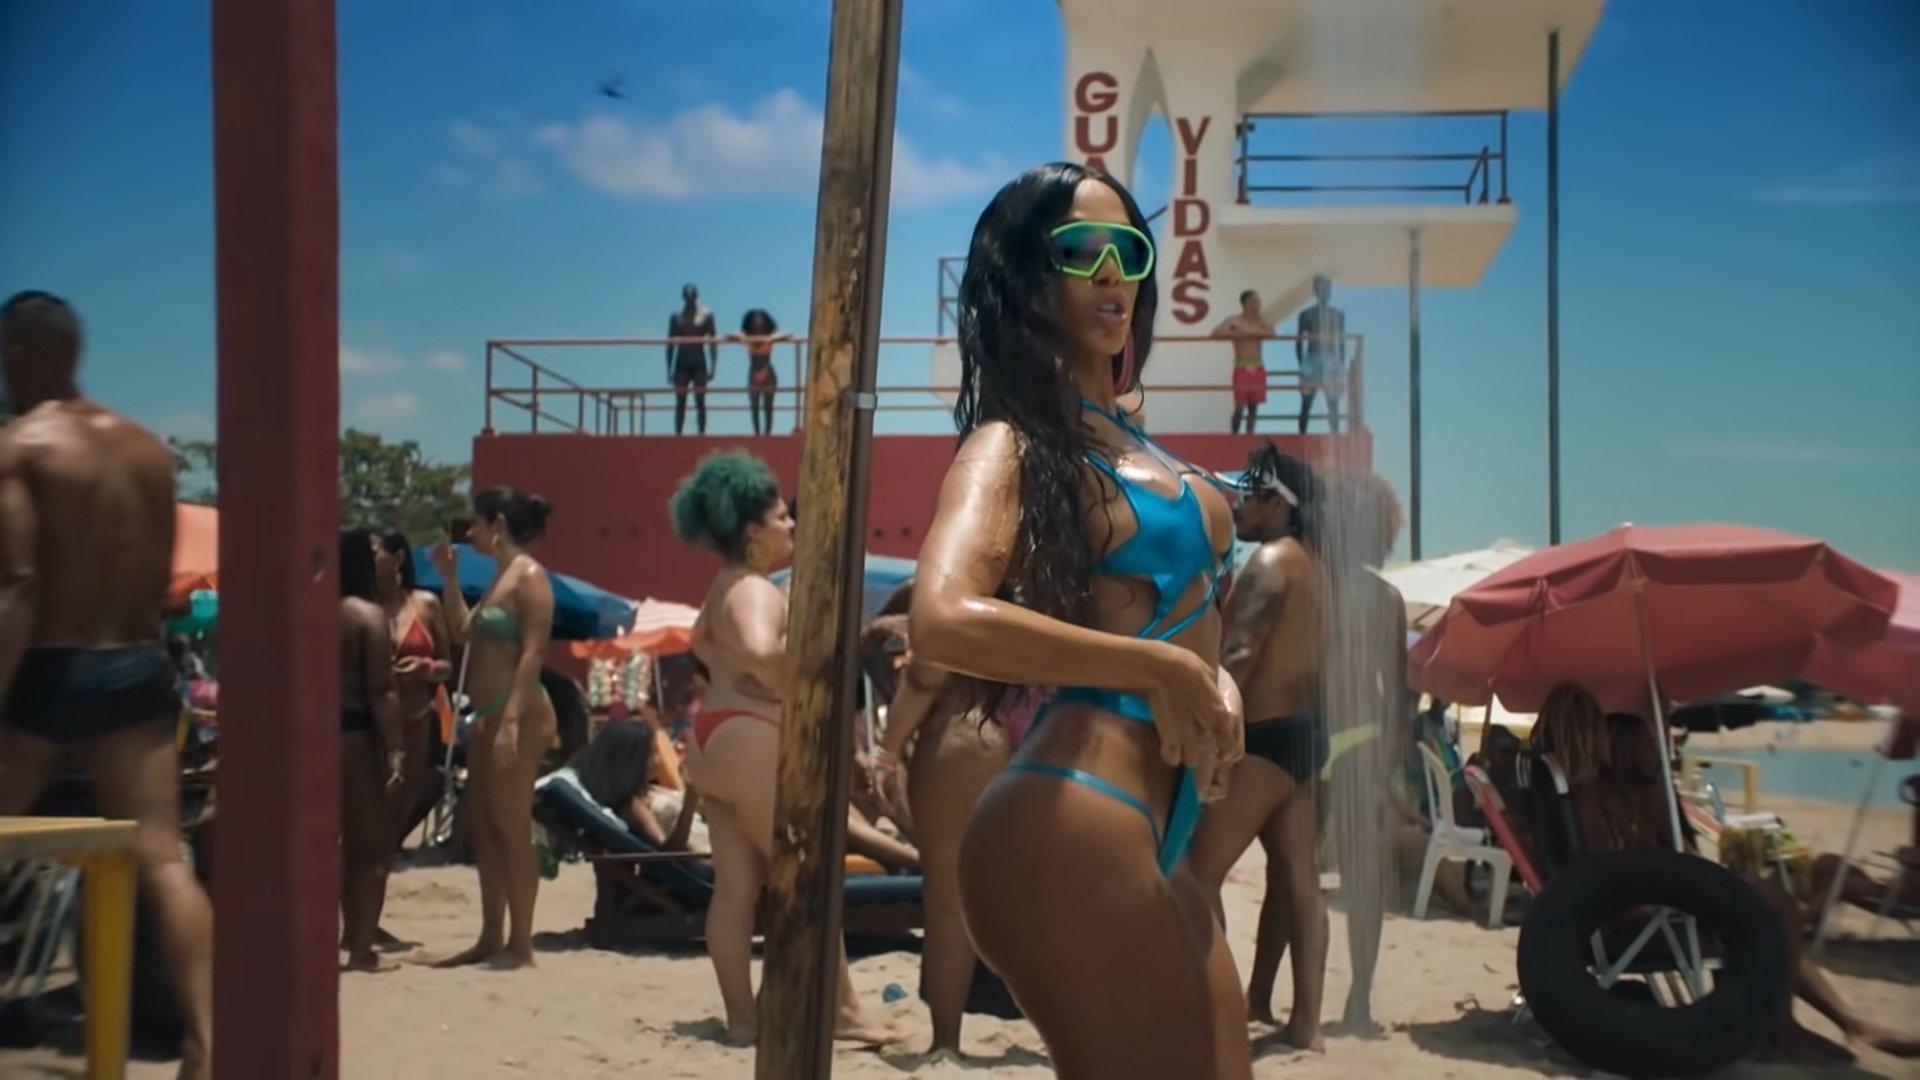 Anitta - Girl From Rio (Official Music Video) 1-23 Screenshot